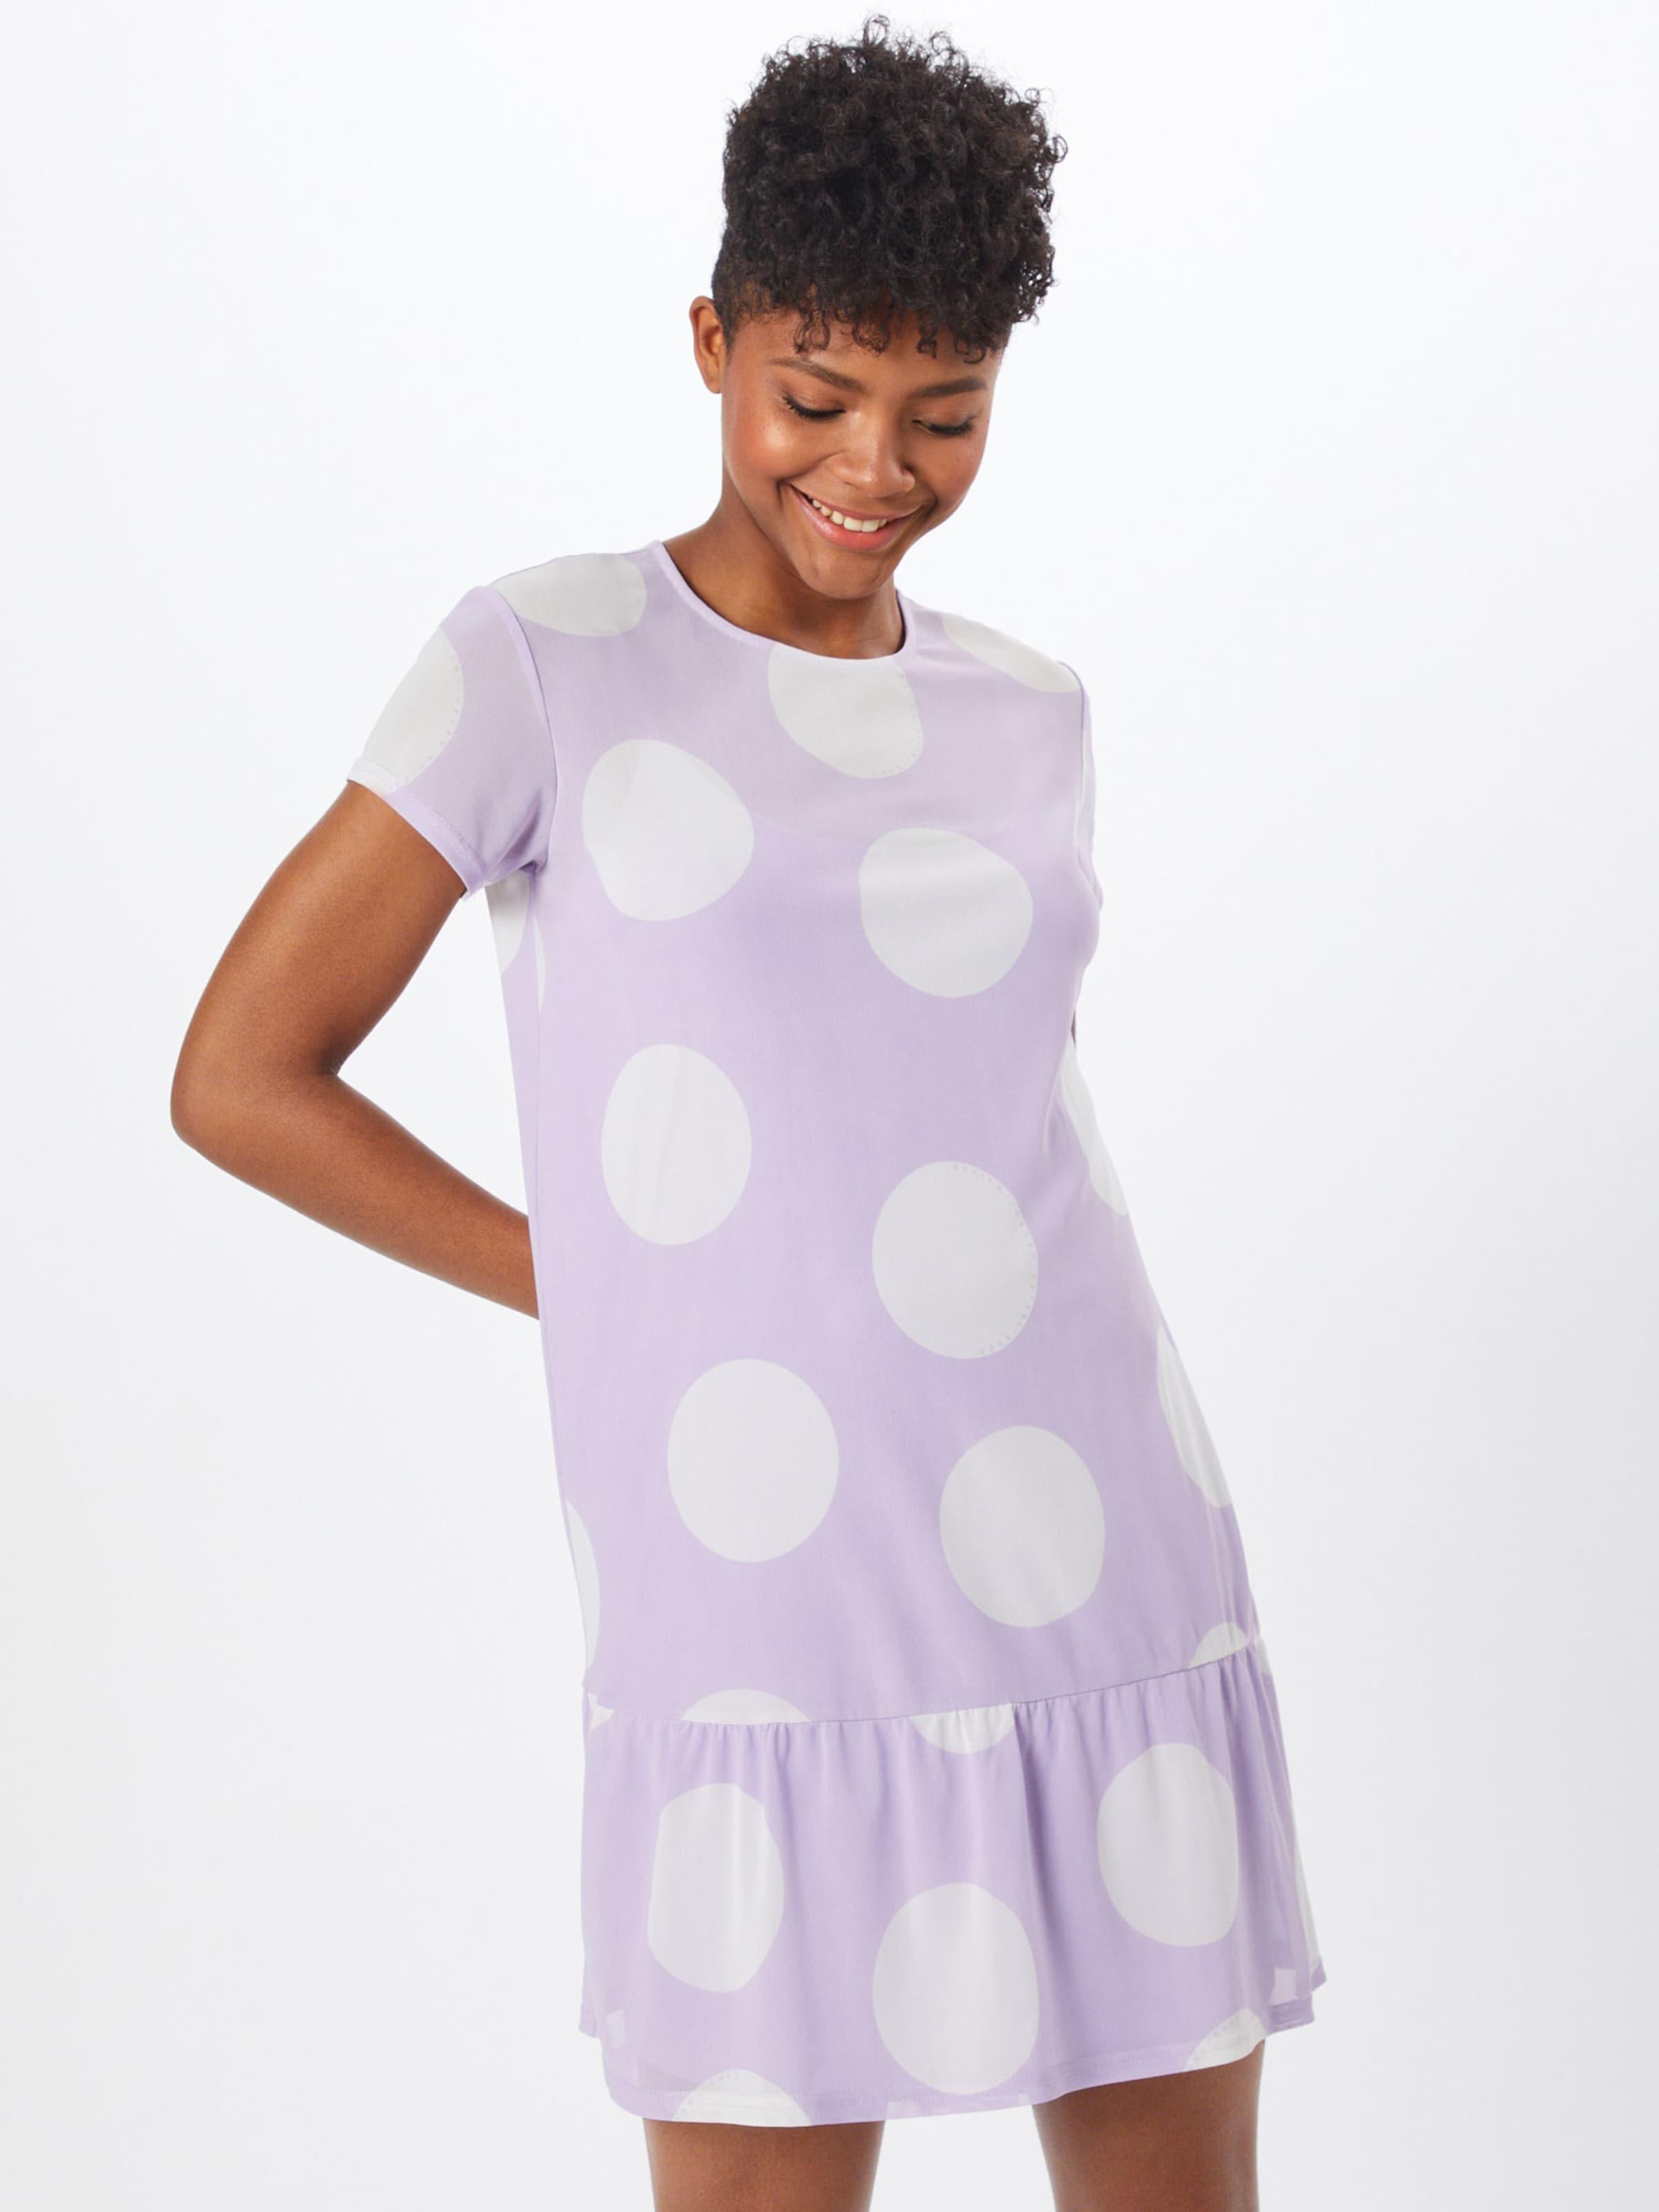 Dot Robe Dress kleid' En Violet PastelBlanc Review 'mesh D CxWBoder